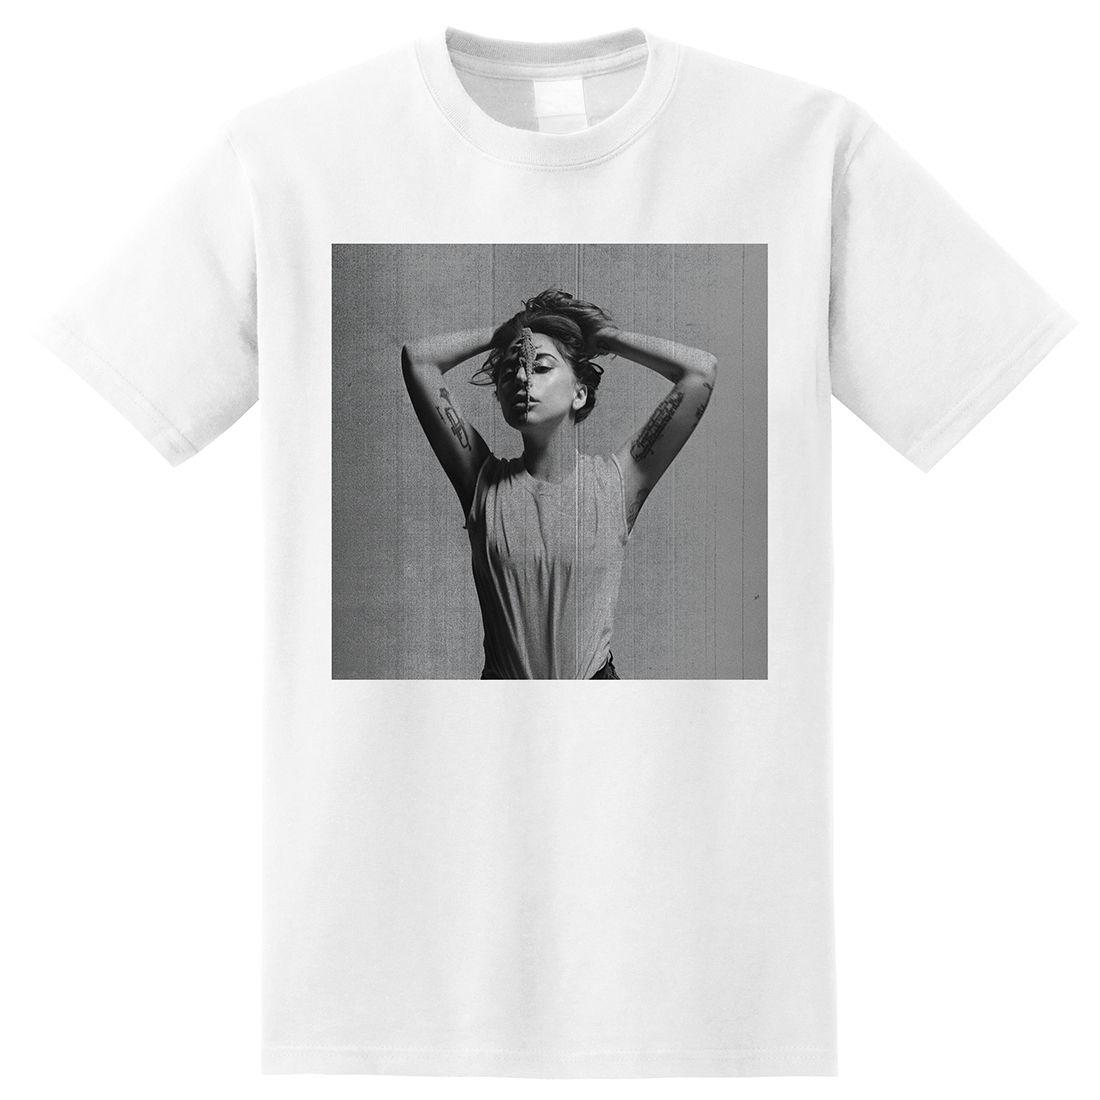 c96e88dce92 Lady Gaga: Lizard T-Shirt Small